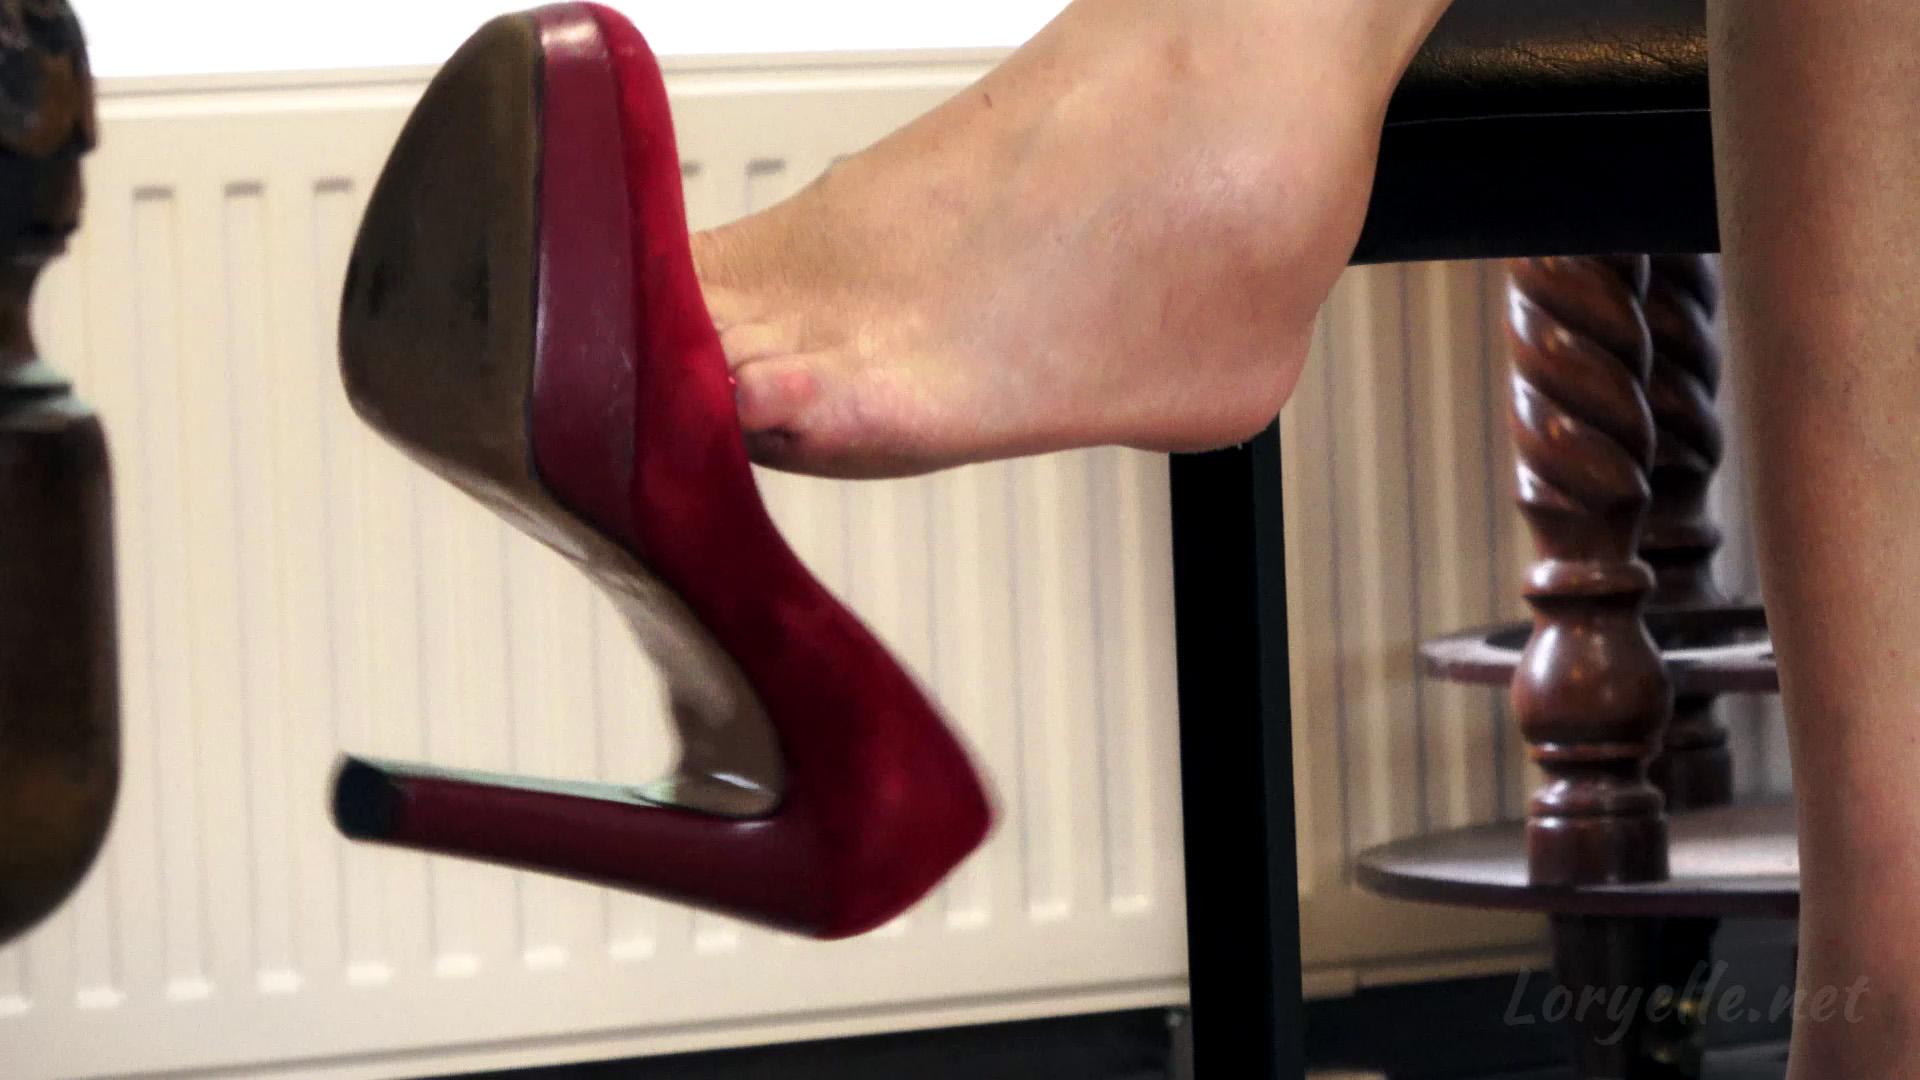 Loryelle Dangling Voyeur Shoe Fetish